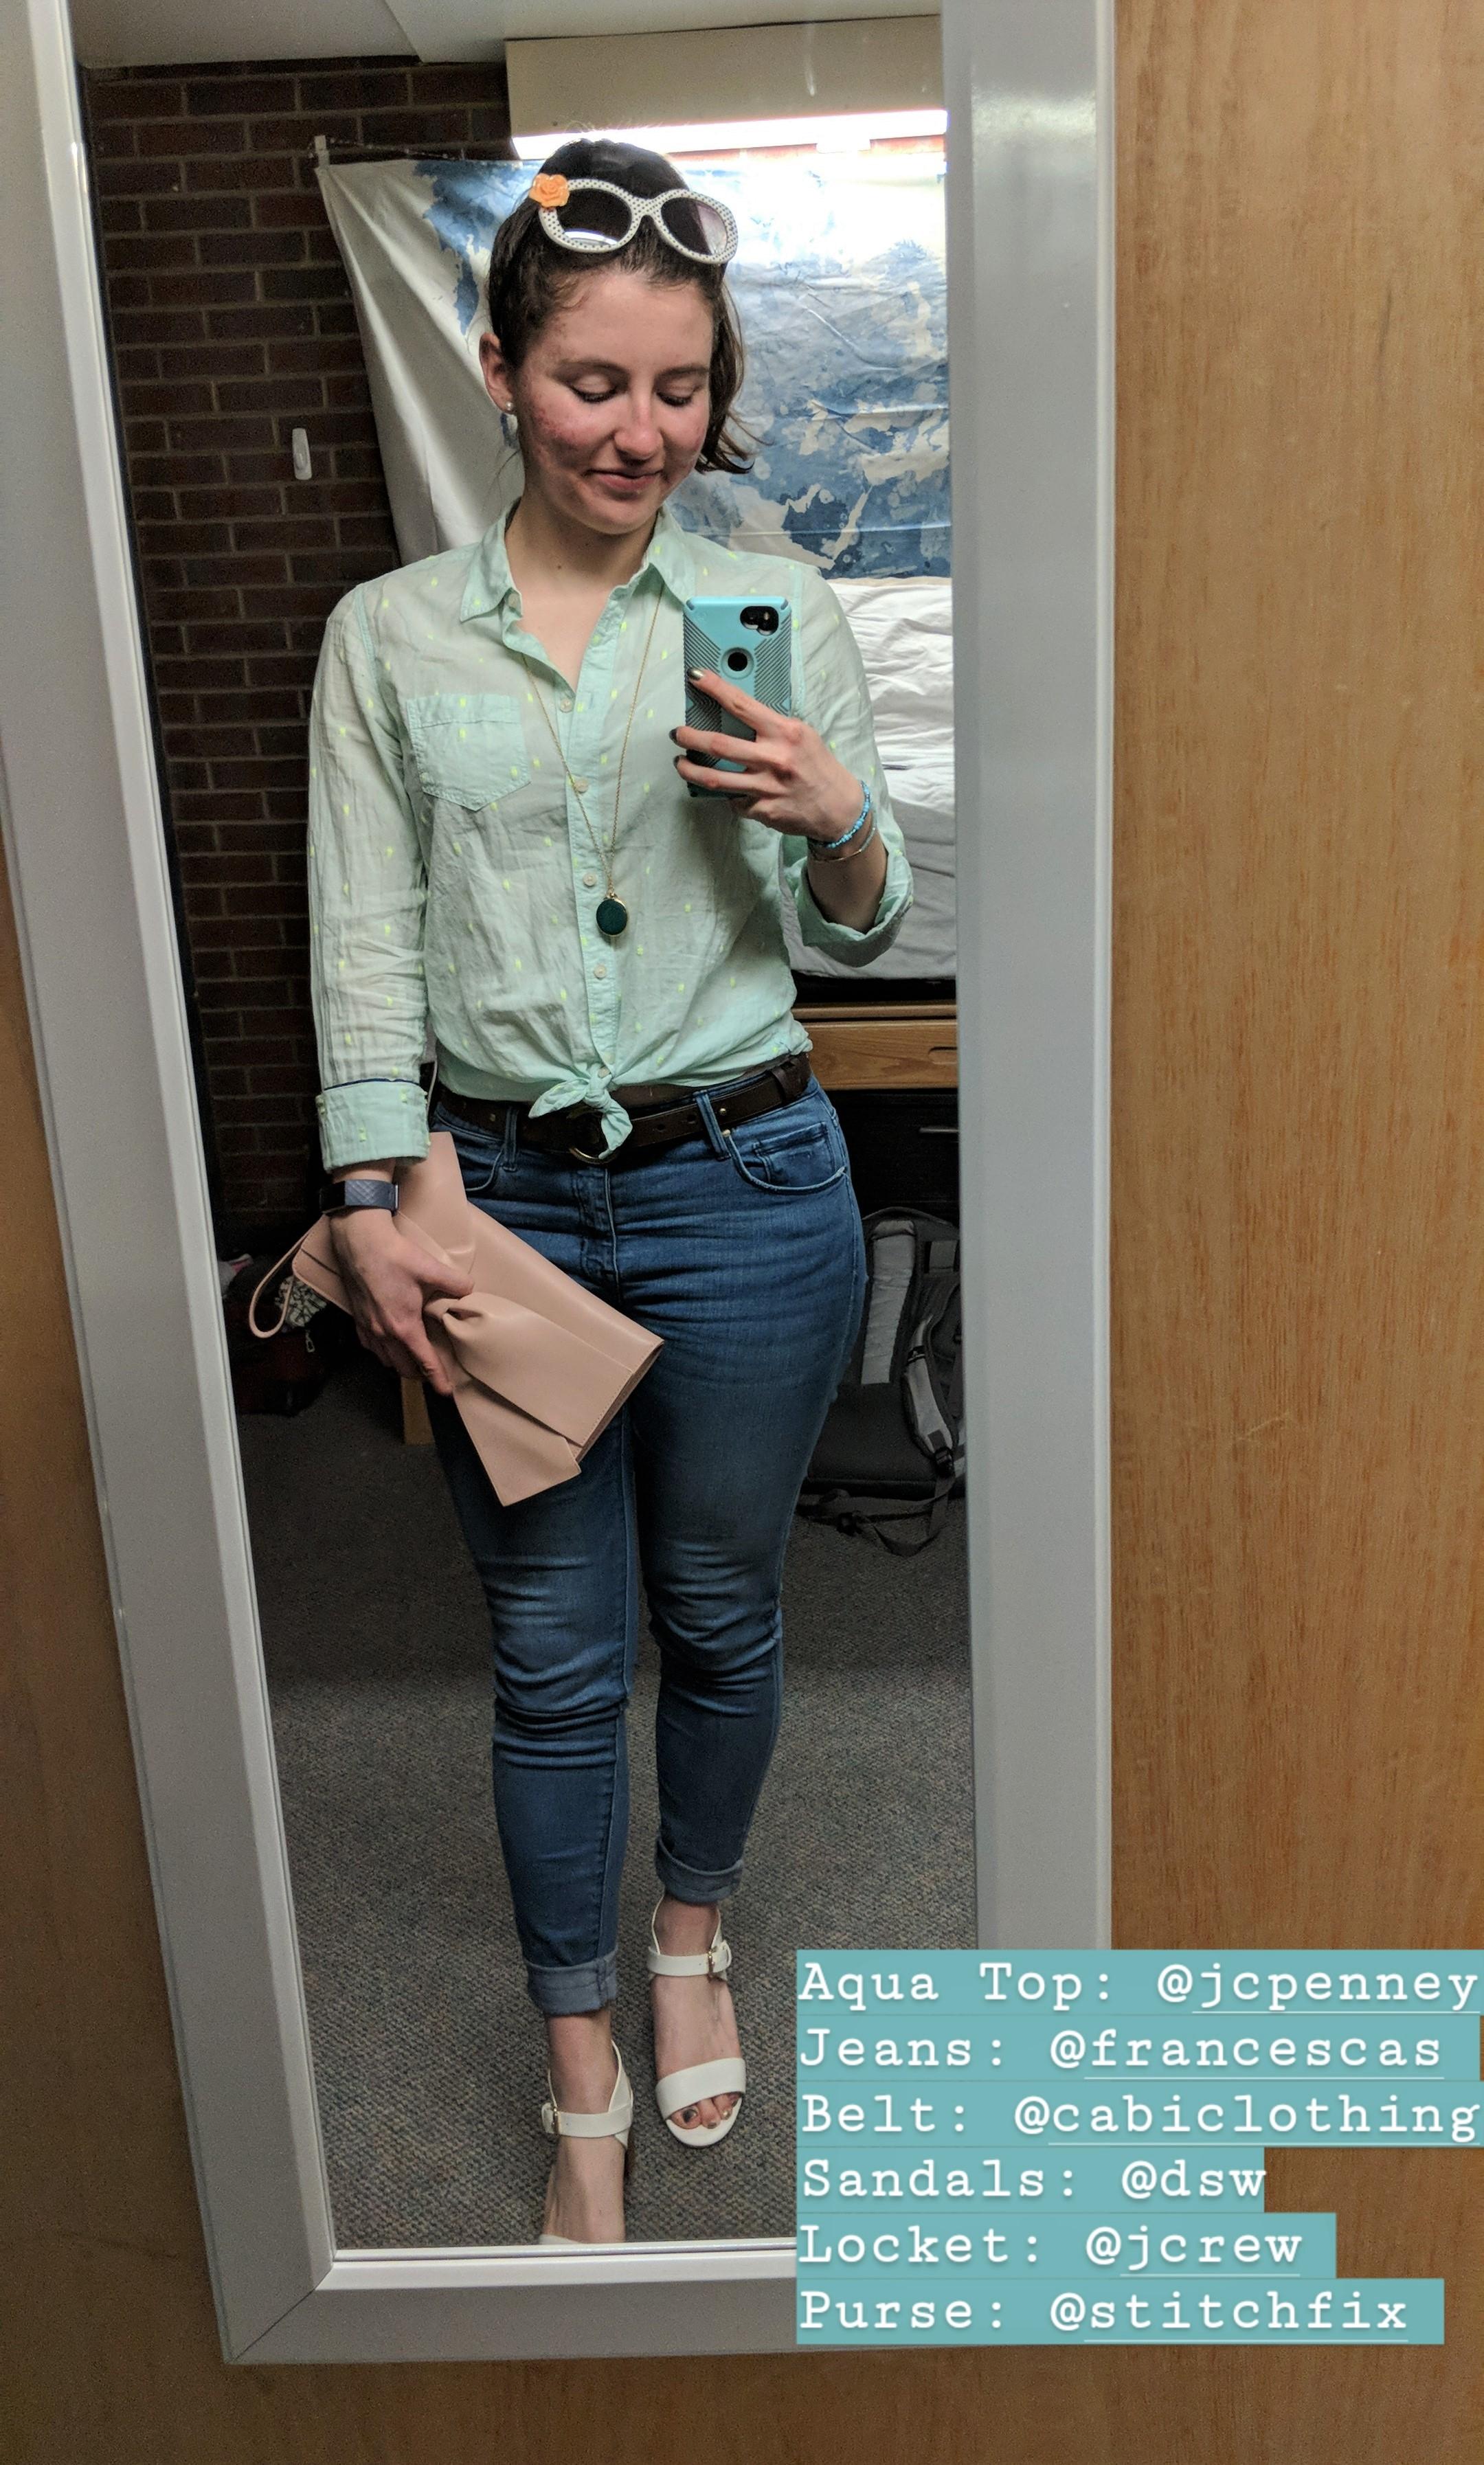 aqua blouse, skinny jeans, white sandal heels